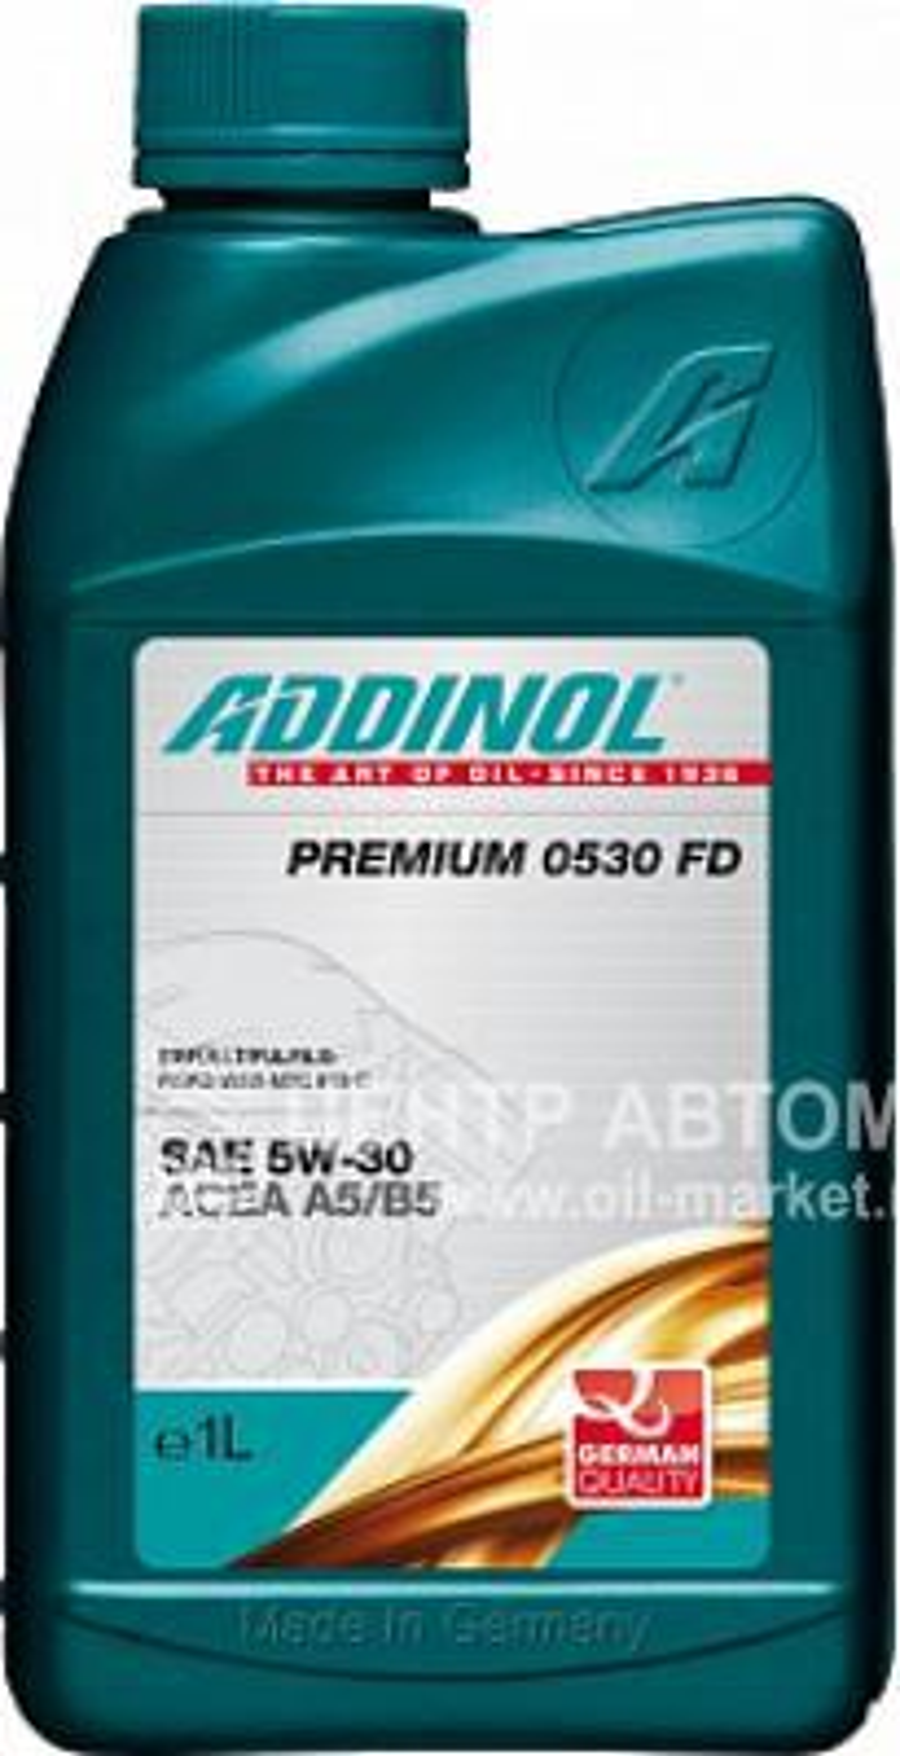 Масло моторное синтетическое Premium 0530 FD 5W-30, 1л